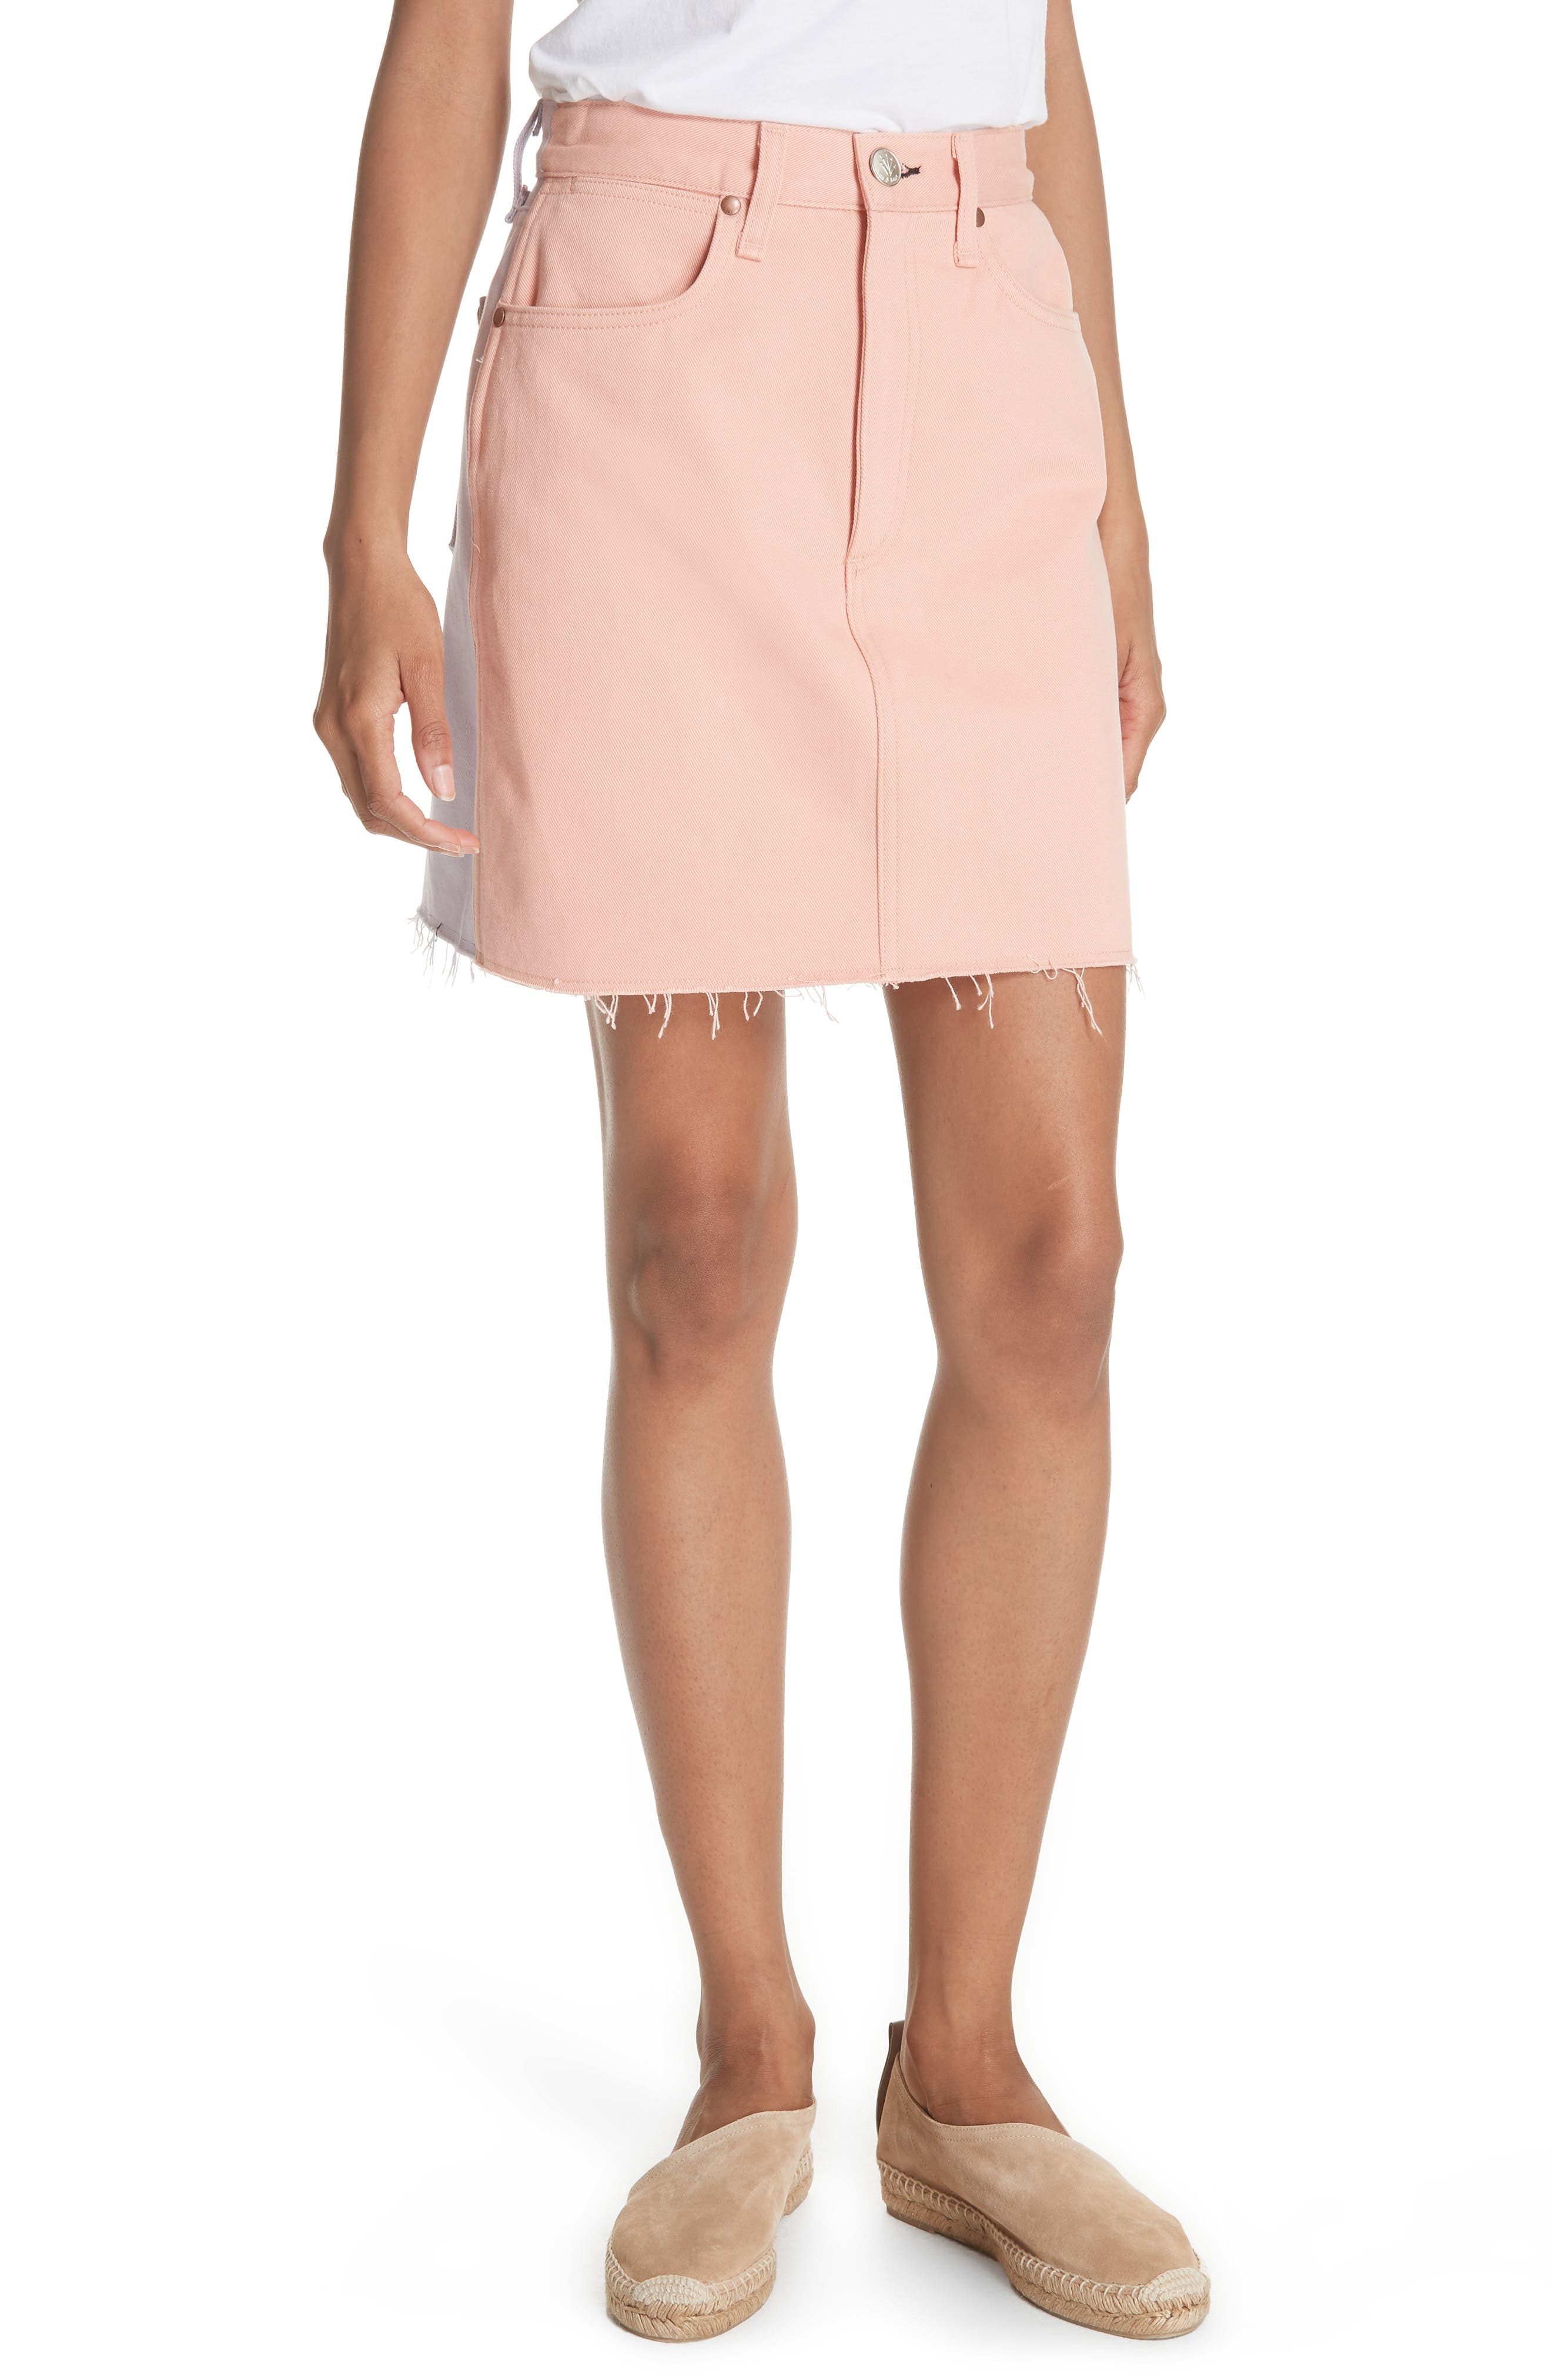 Moss Skirt,                         Main,                         color, Peach/ Lilac